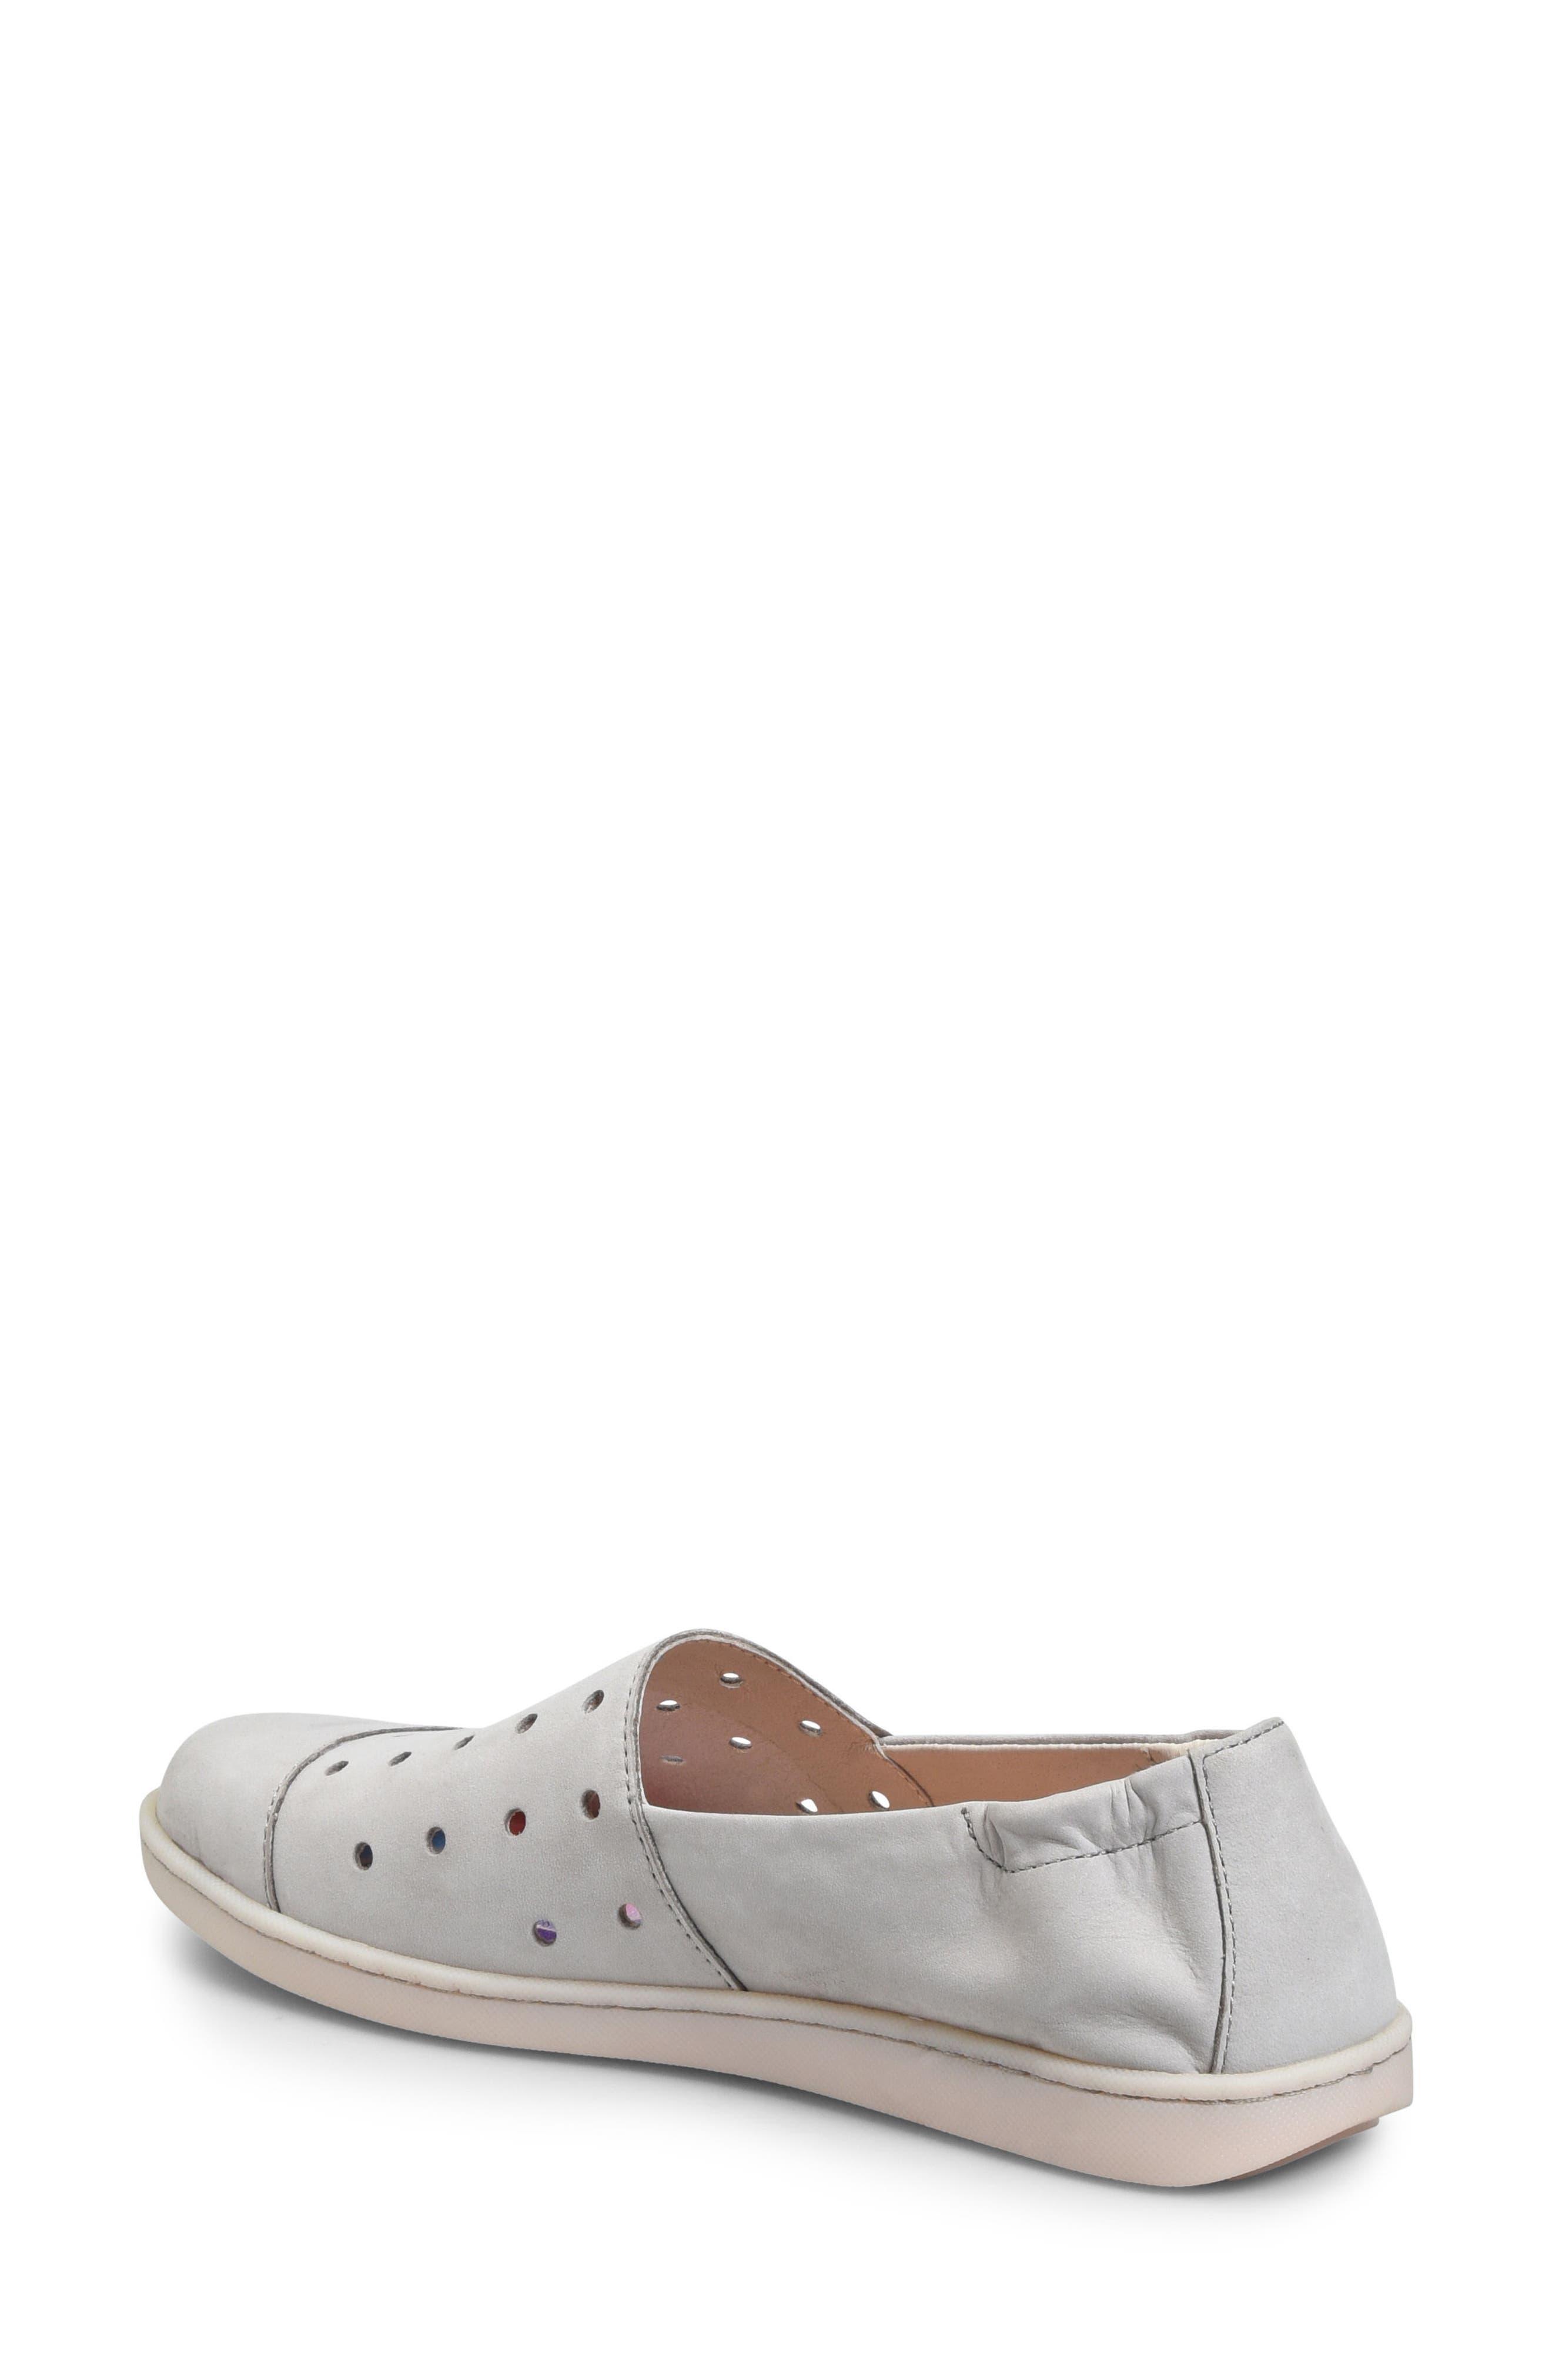 Kristin Sneaker,                             Alternate thumbnail 2, color,                             Light Grey Nubuck Leather